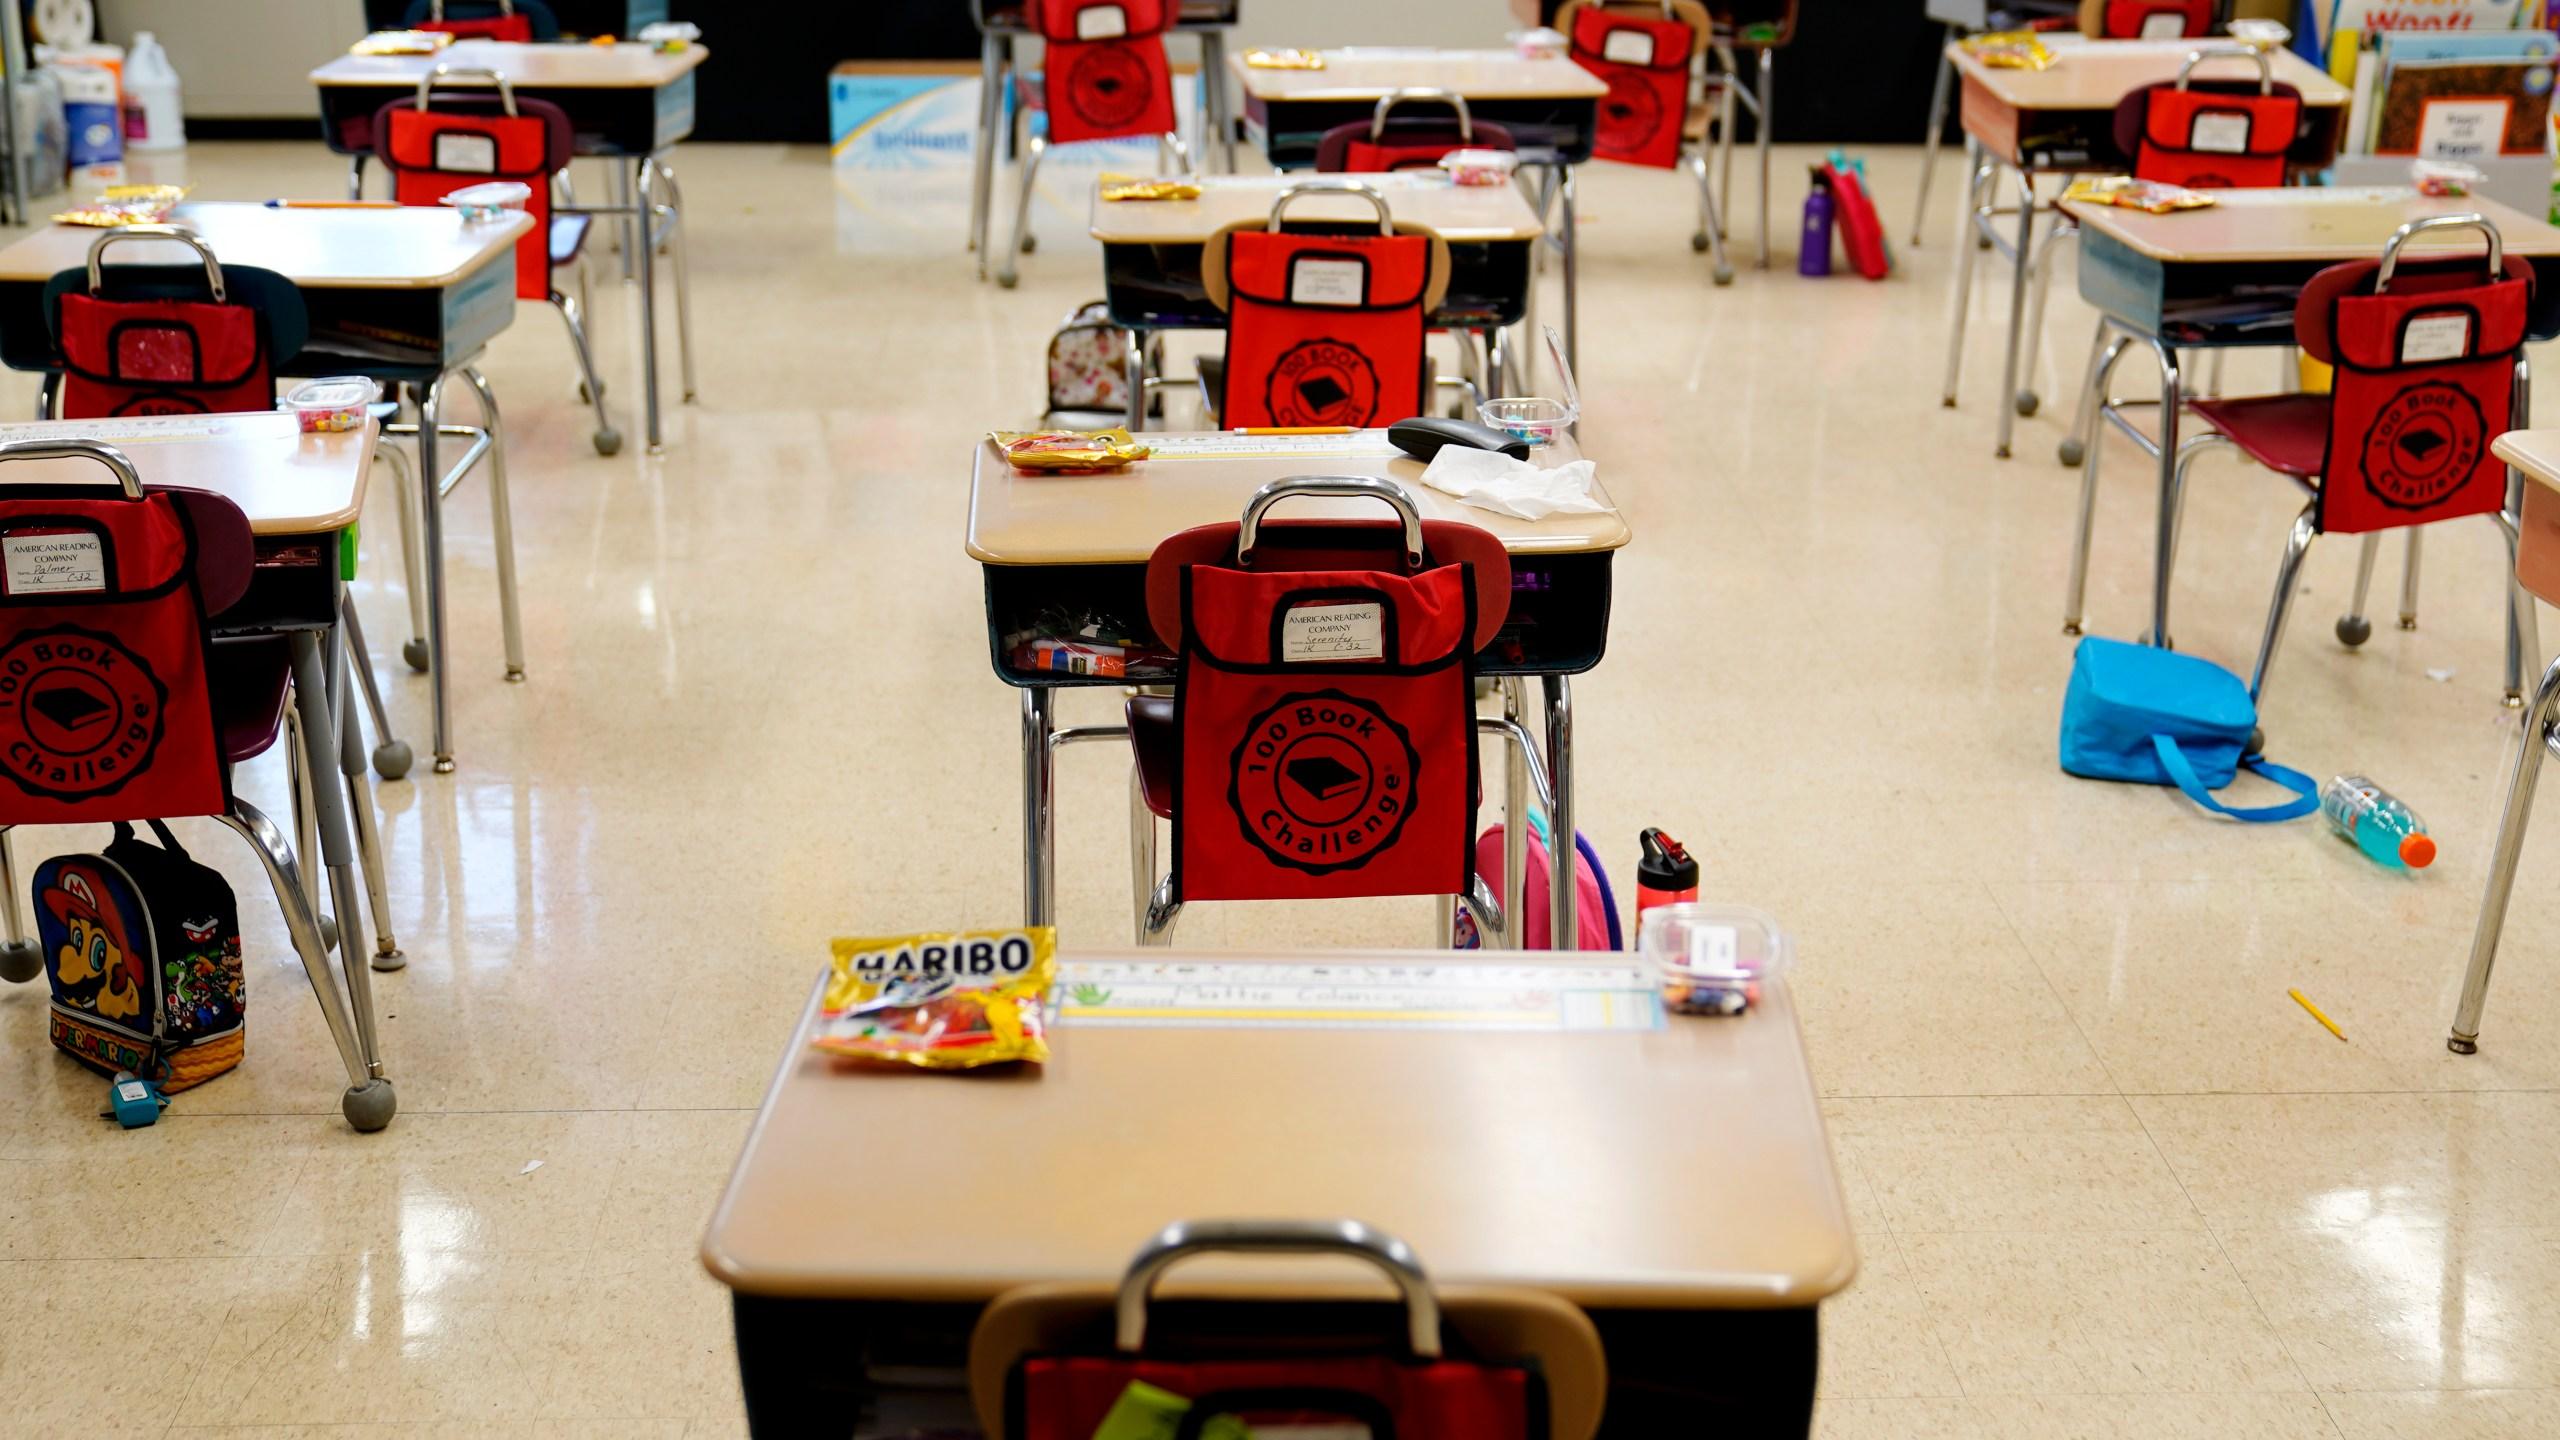 image of classroom